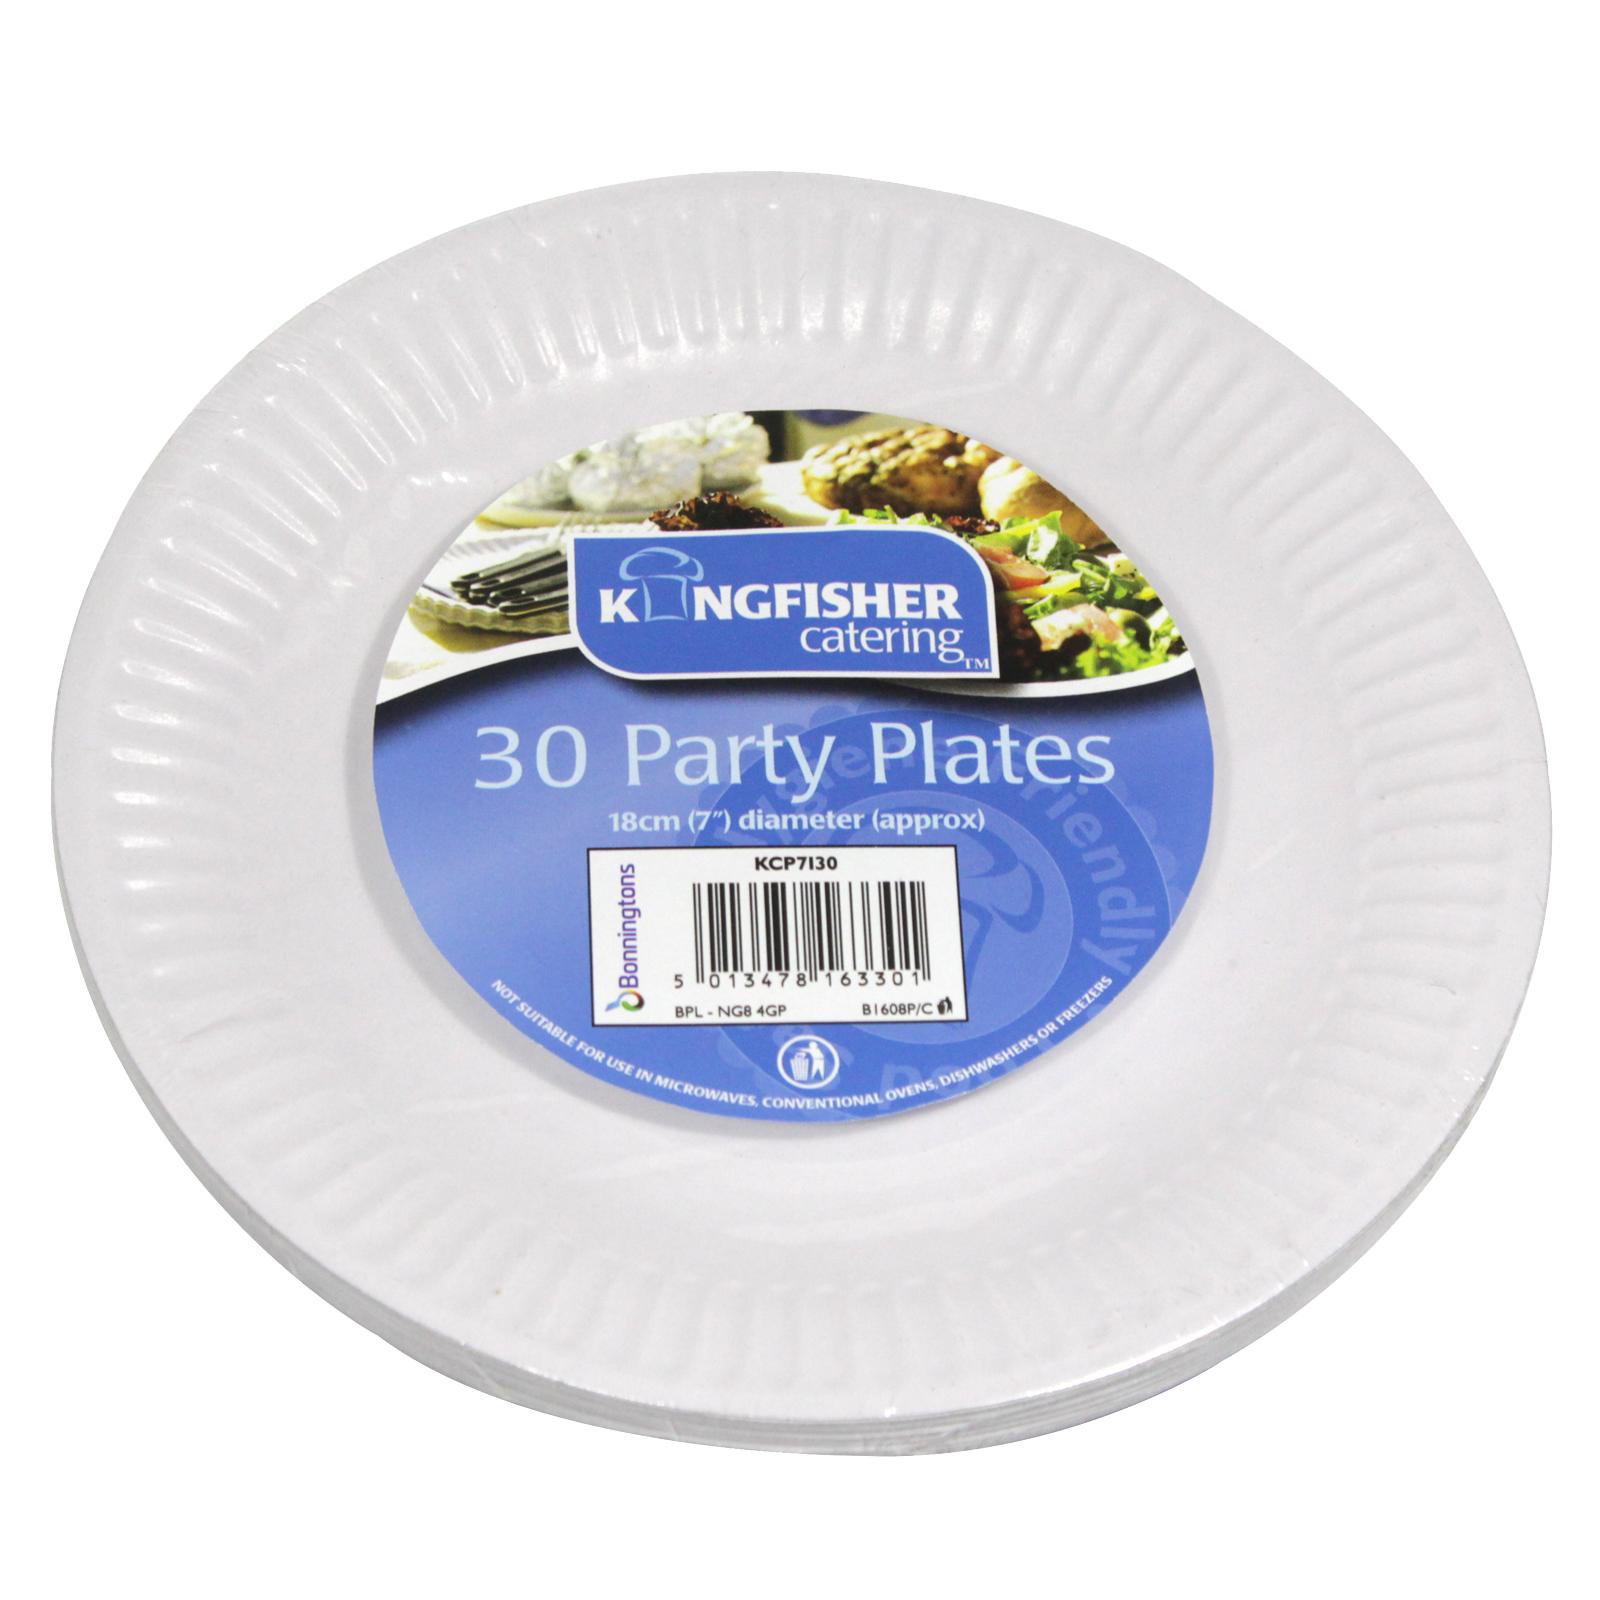 KINGFISHER 30X7 PAPER PLATES WHITE 10 FREE PLATES